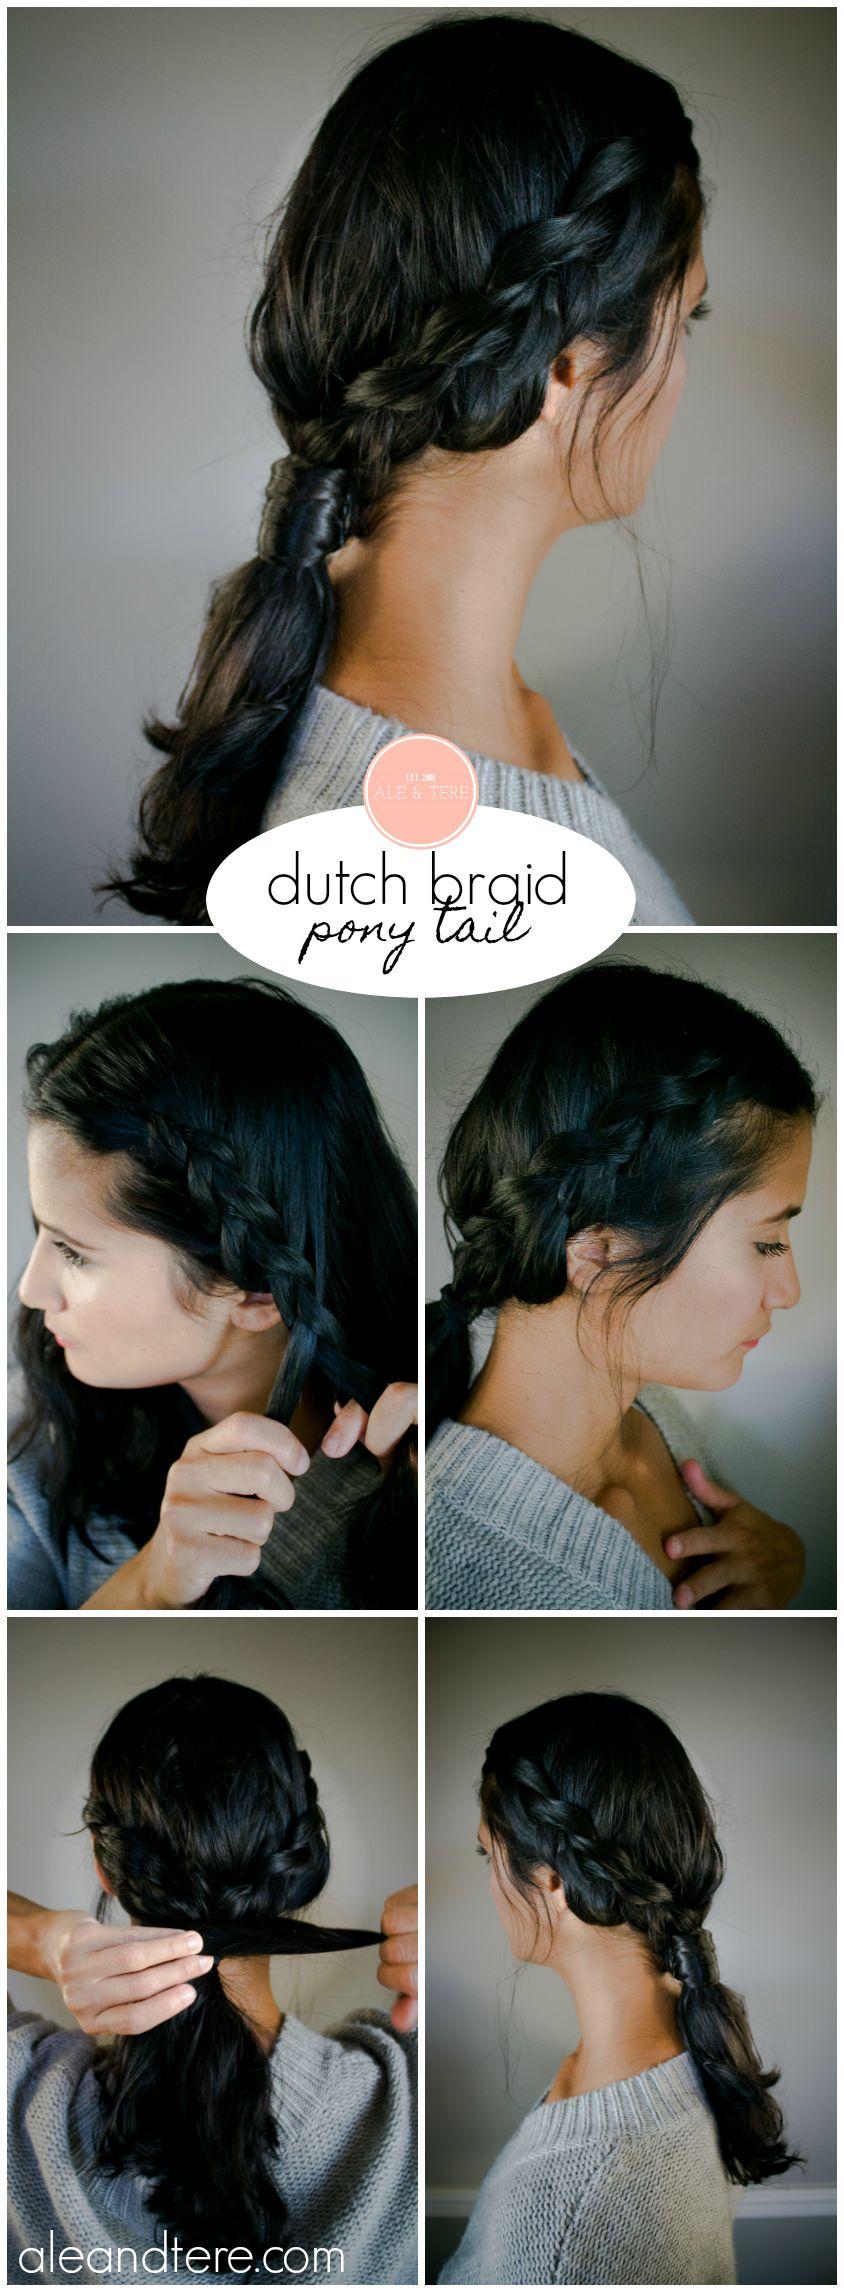 dutch braid ponytail hairstyles easy hairstyles mom hairstyles